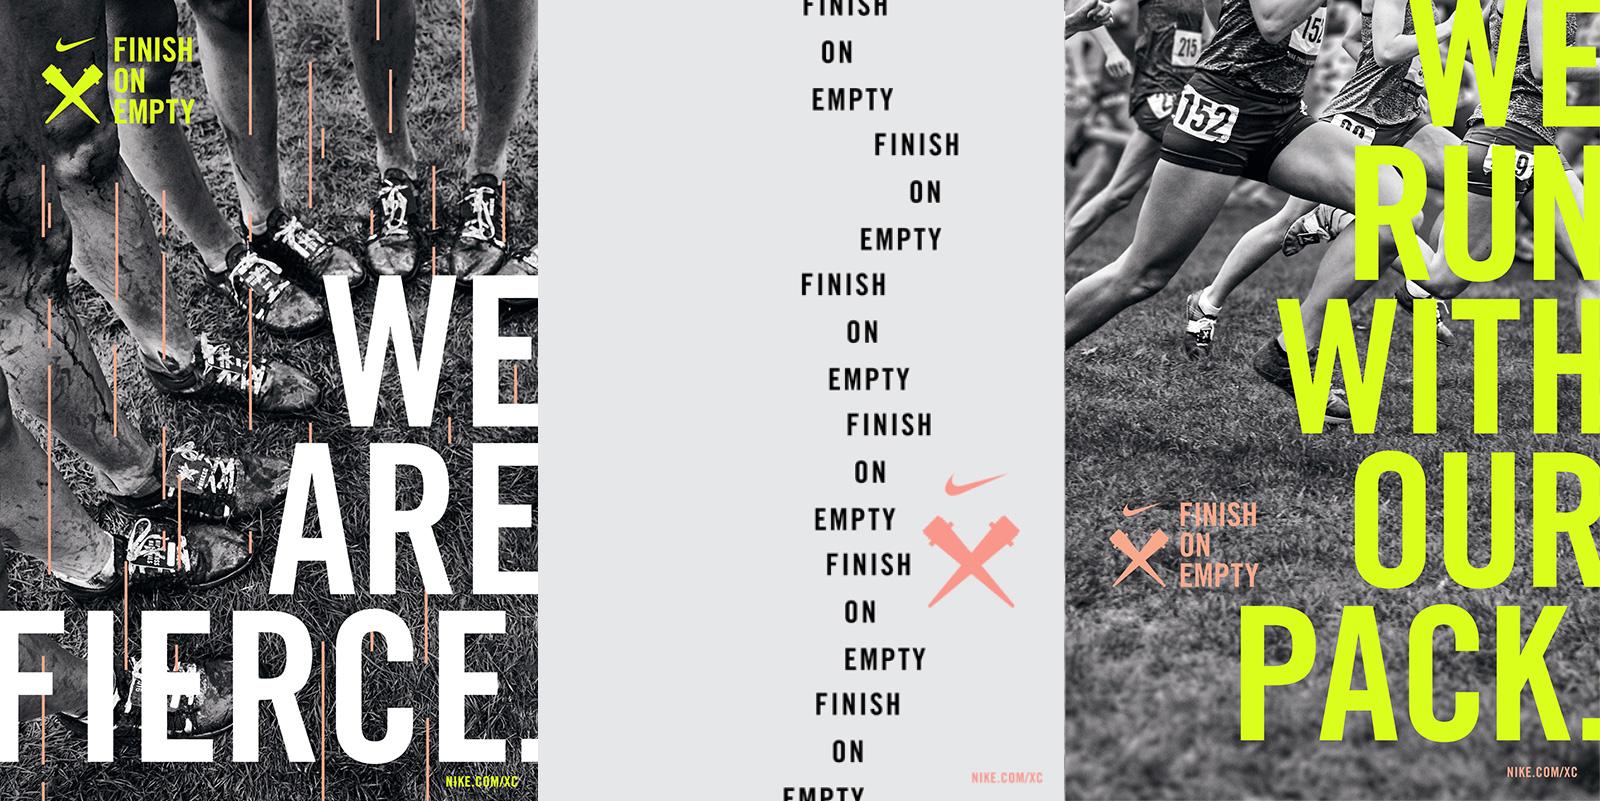 Nike_XC_Zilka_poster_Series